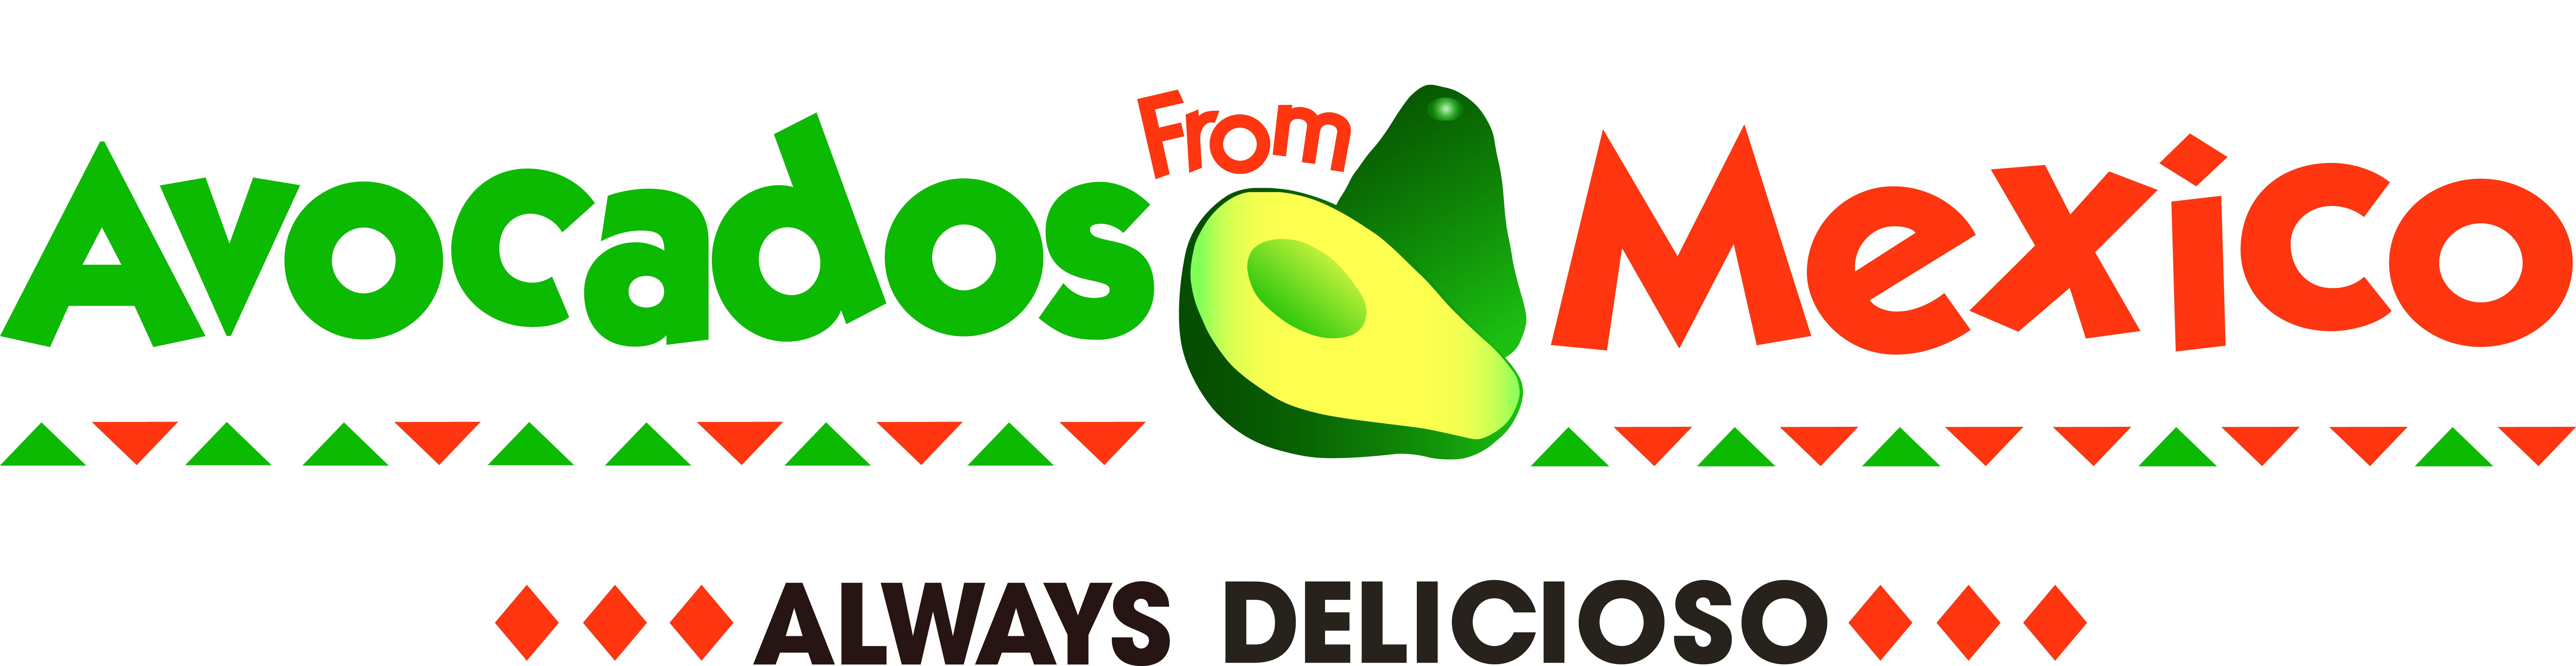 AFM_LOGO_always_delicioso